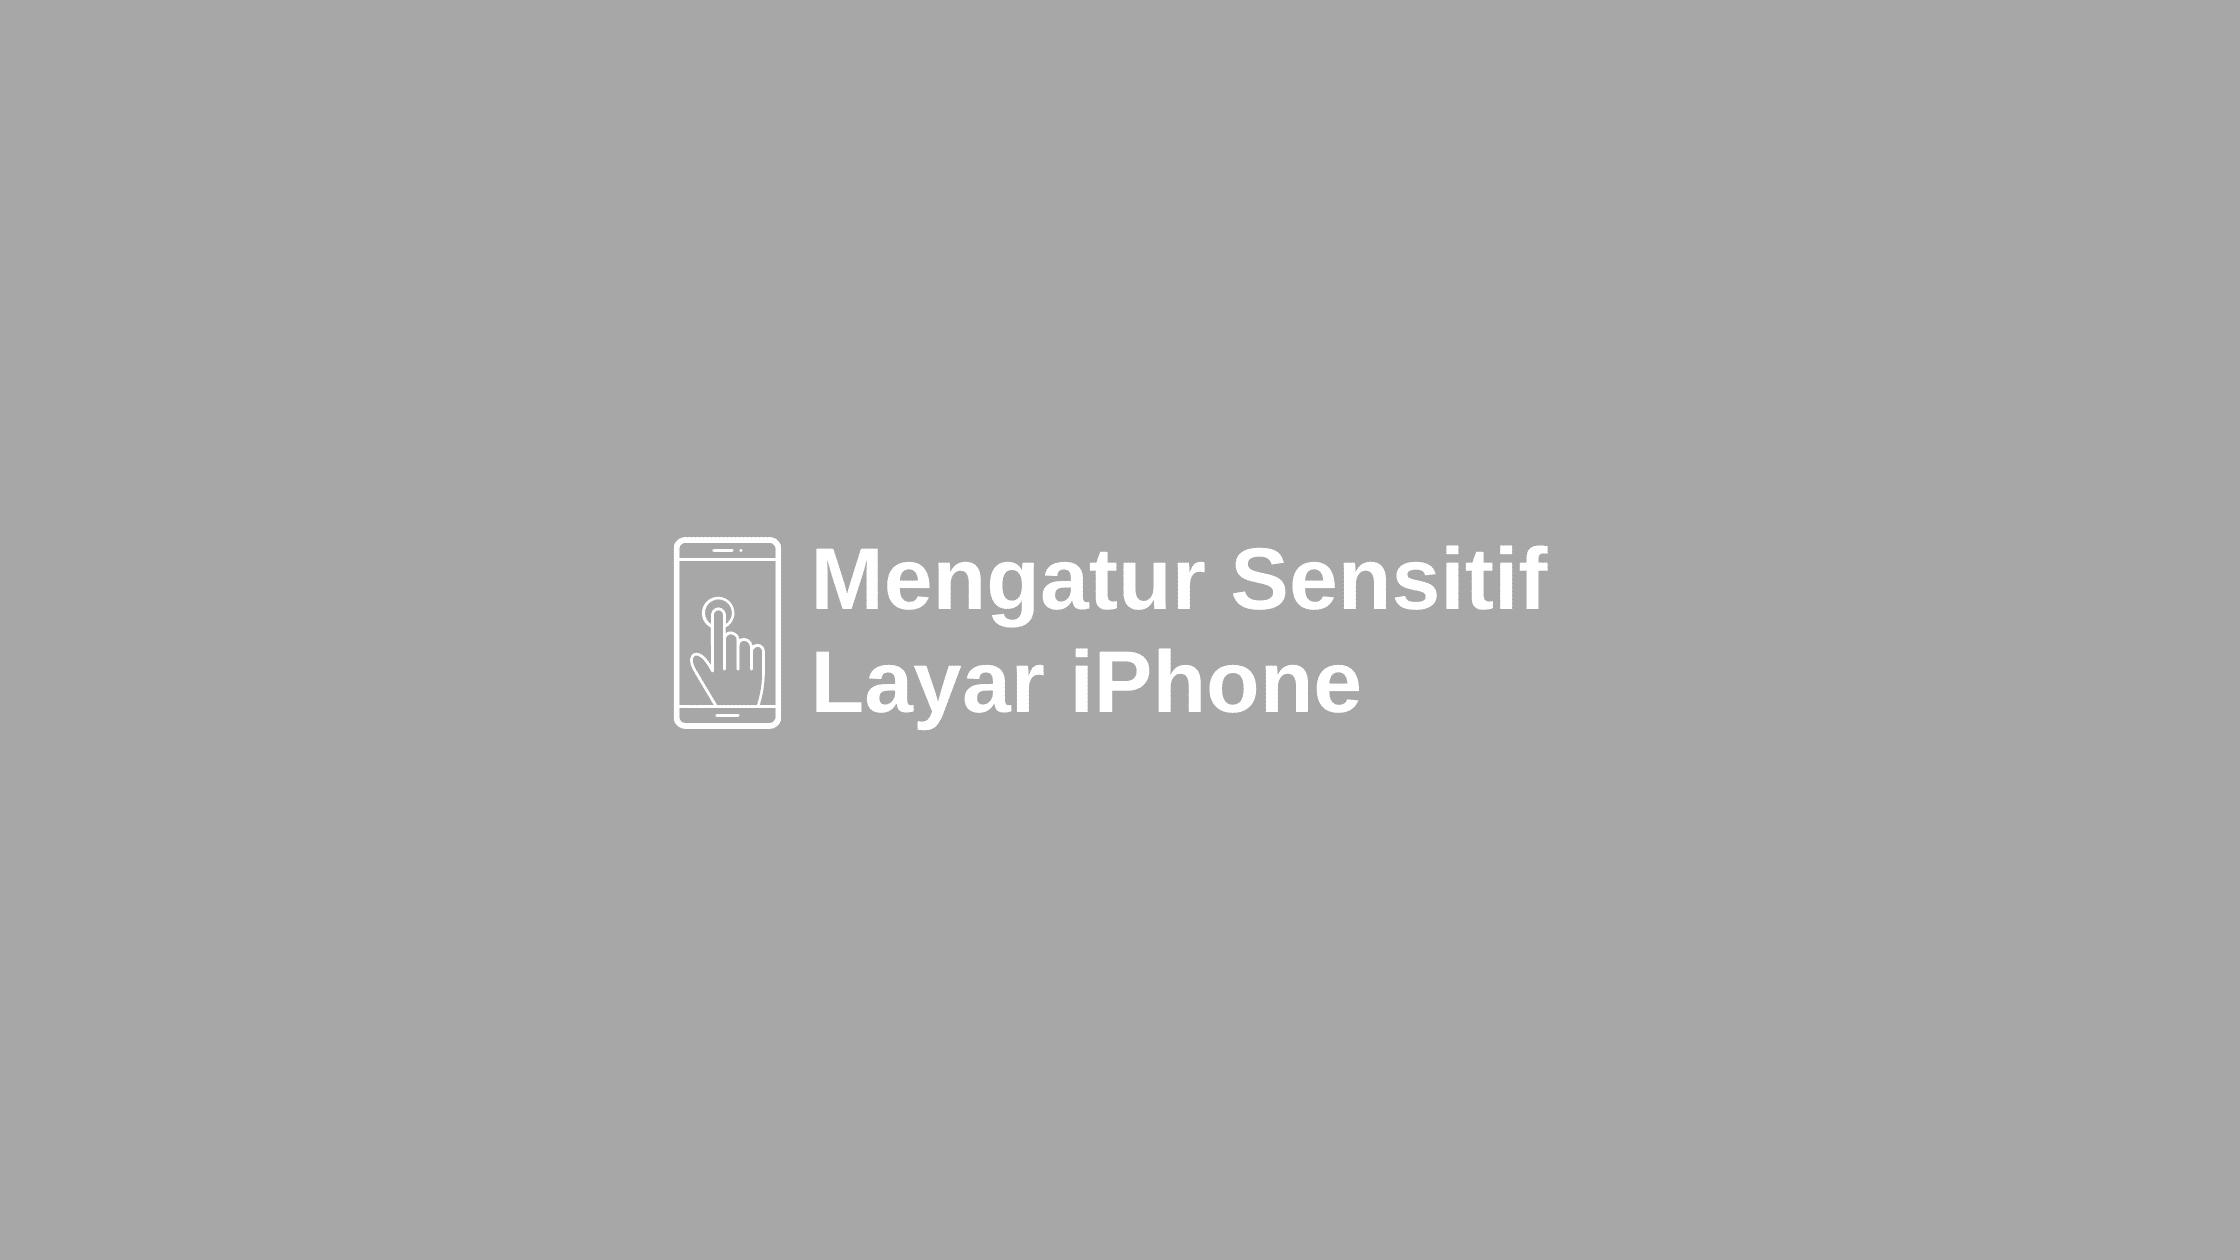 cara mengatur sensitif layar iphone